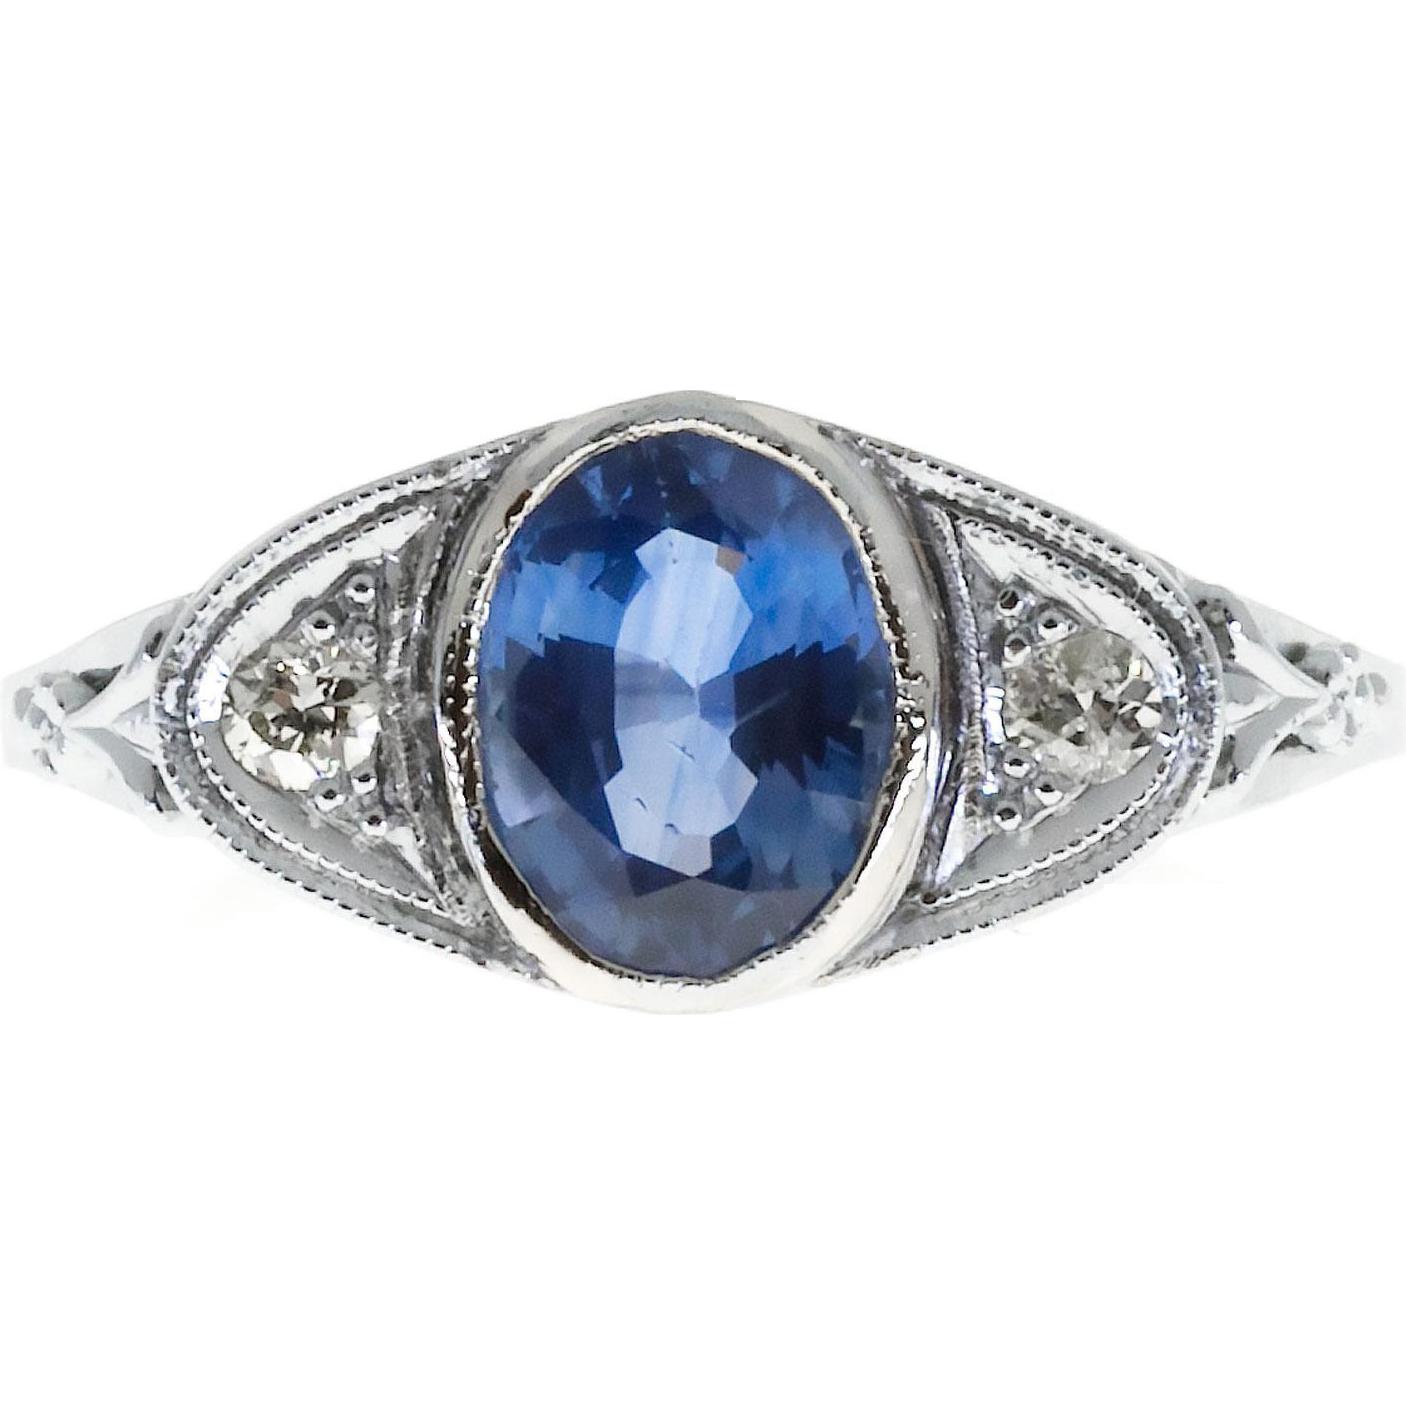 Sapphire Diamond Engraved Filigree 14 Karat White Gold Engagement Ring